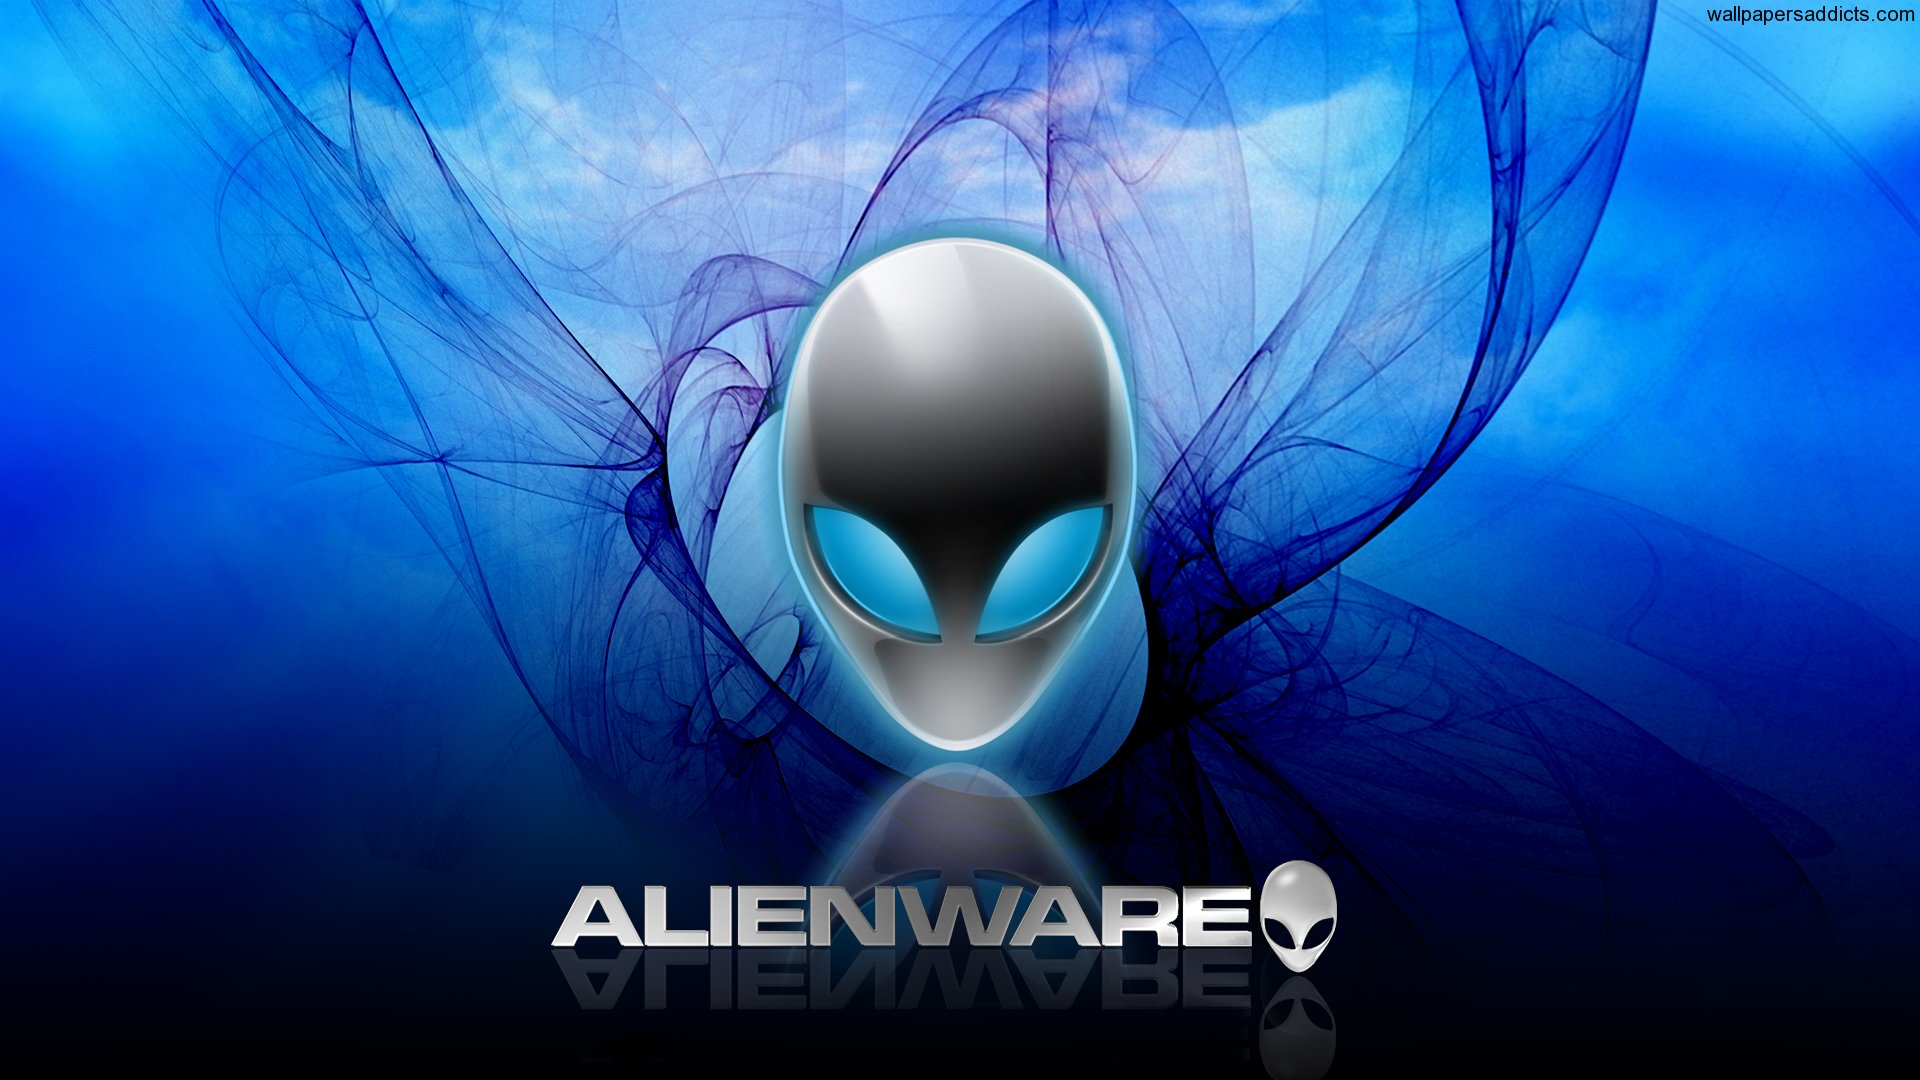 75+ Alienware Hd Wallpapers on WallpaperSafari